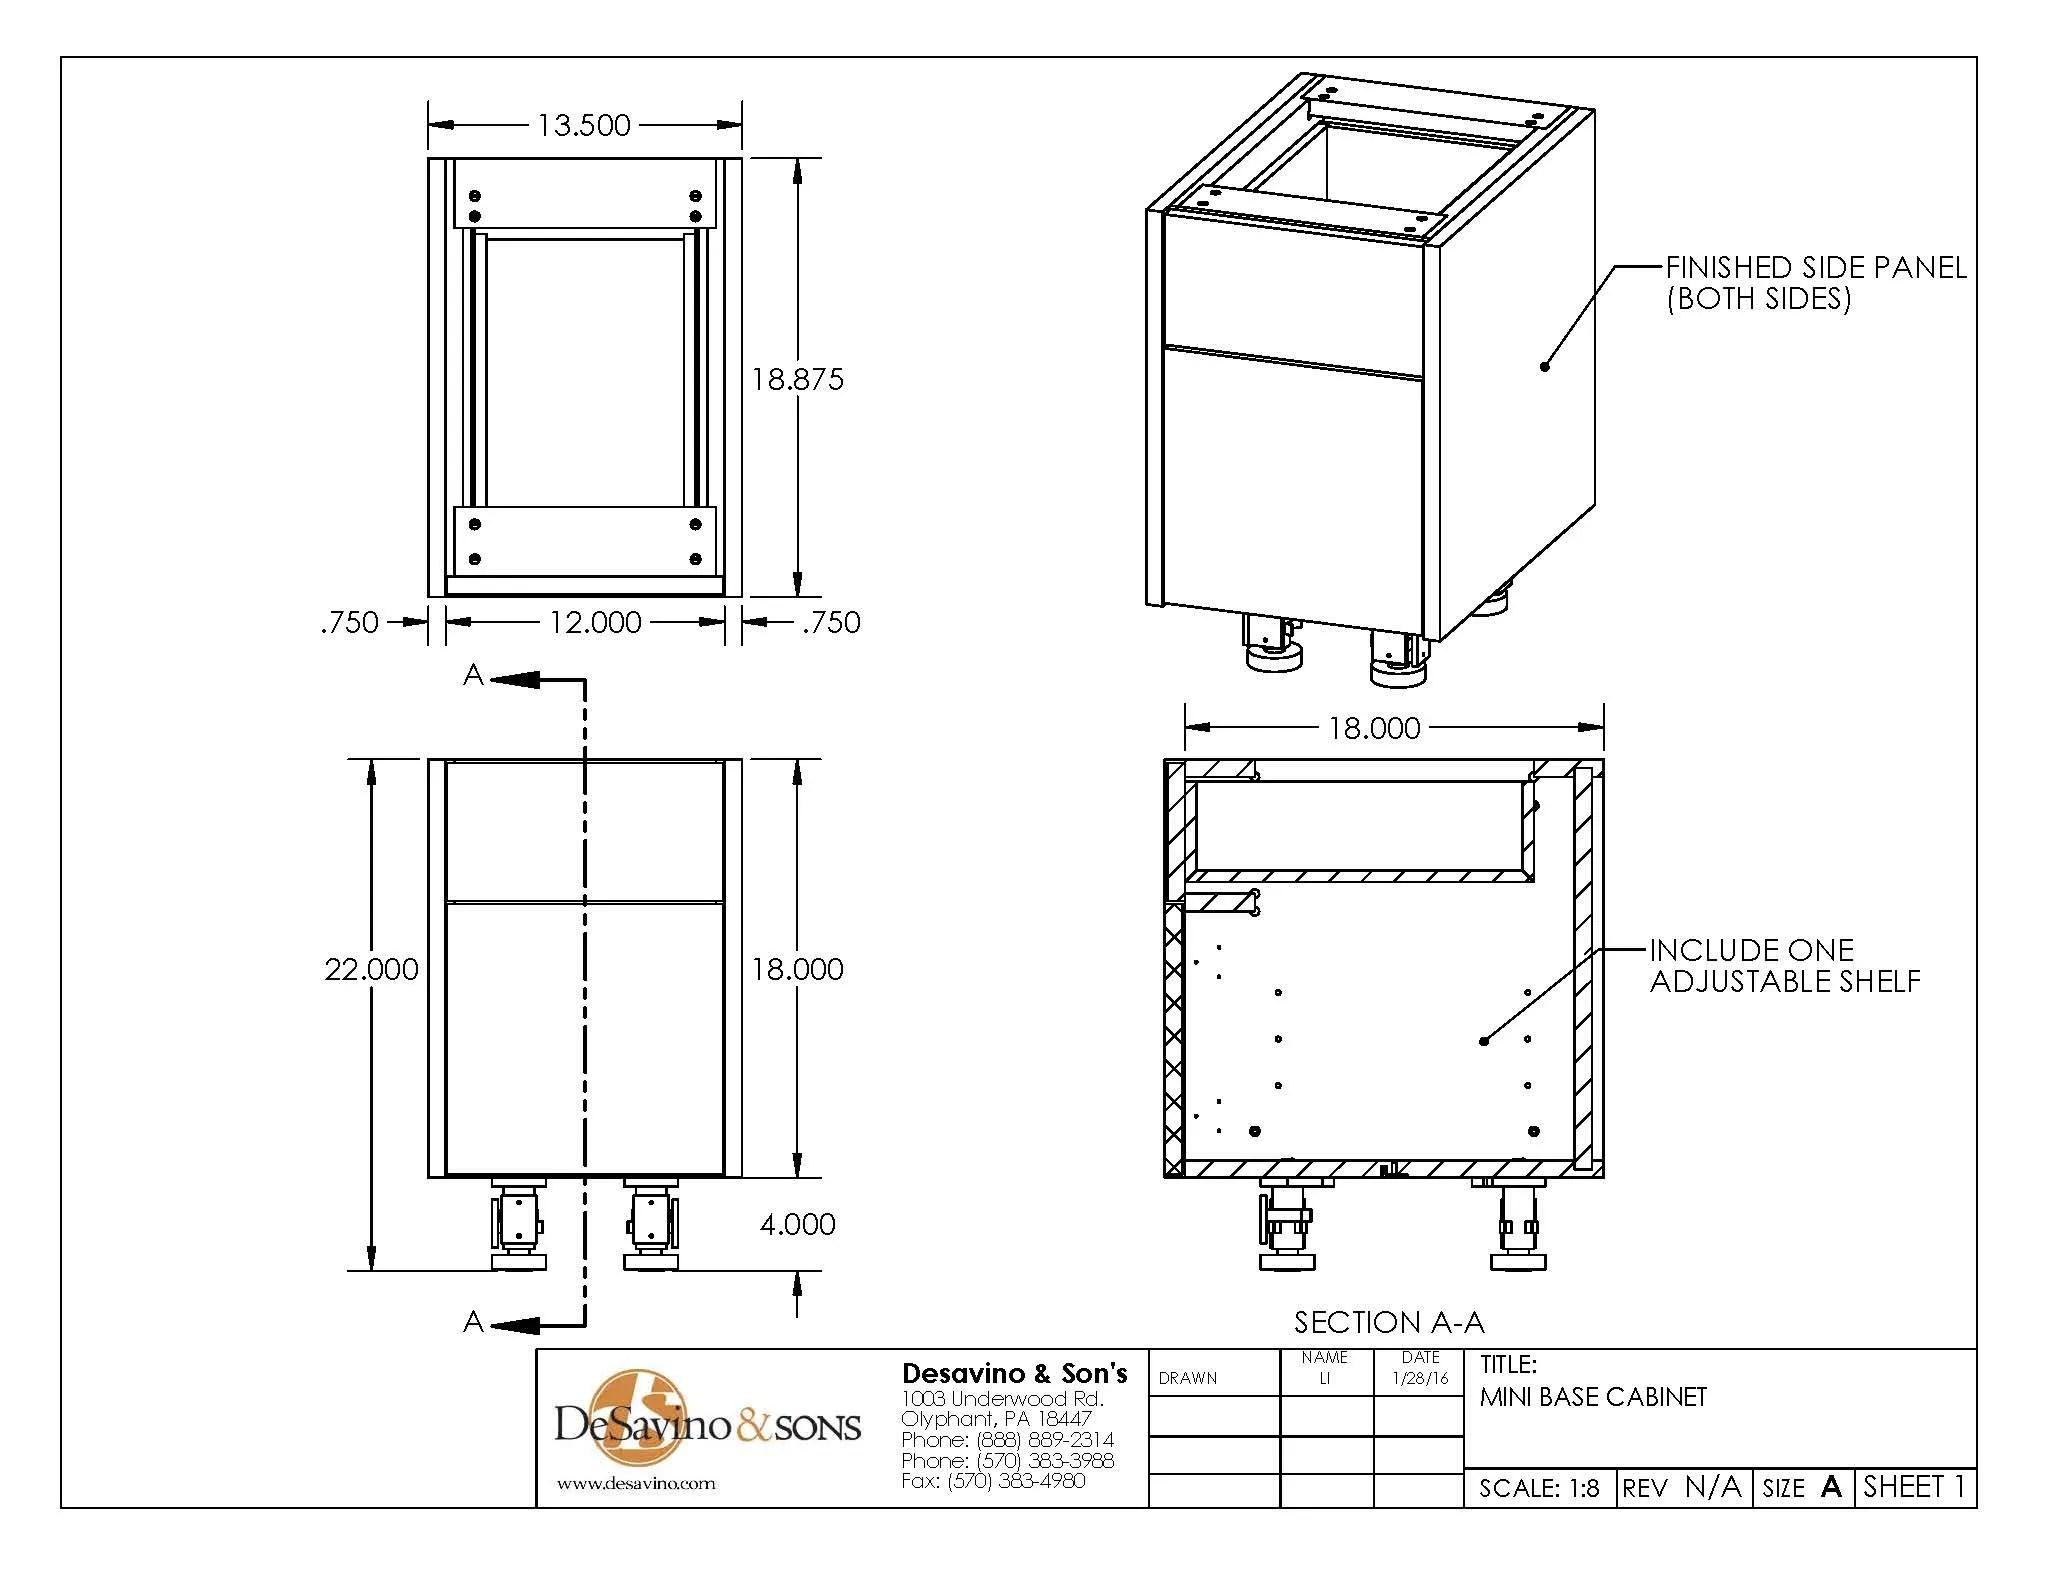 Mini Base Cabinet